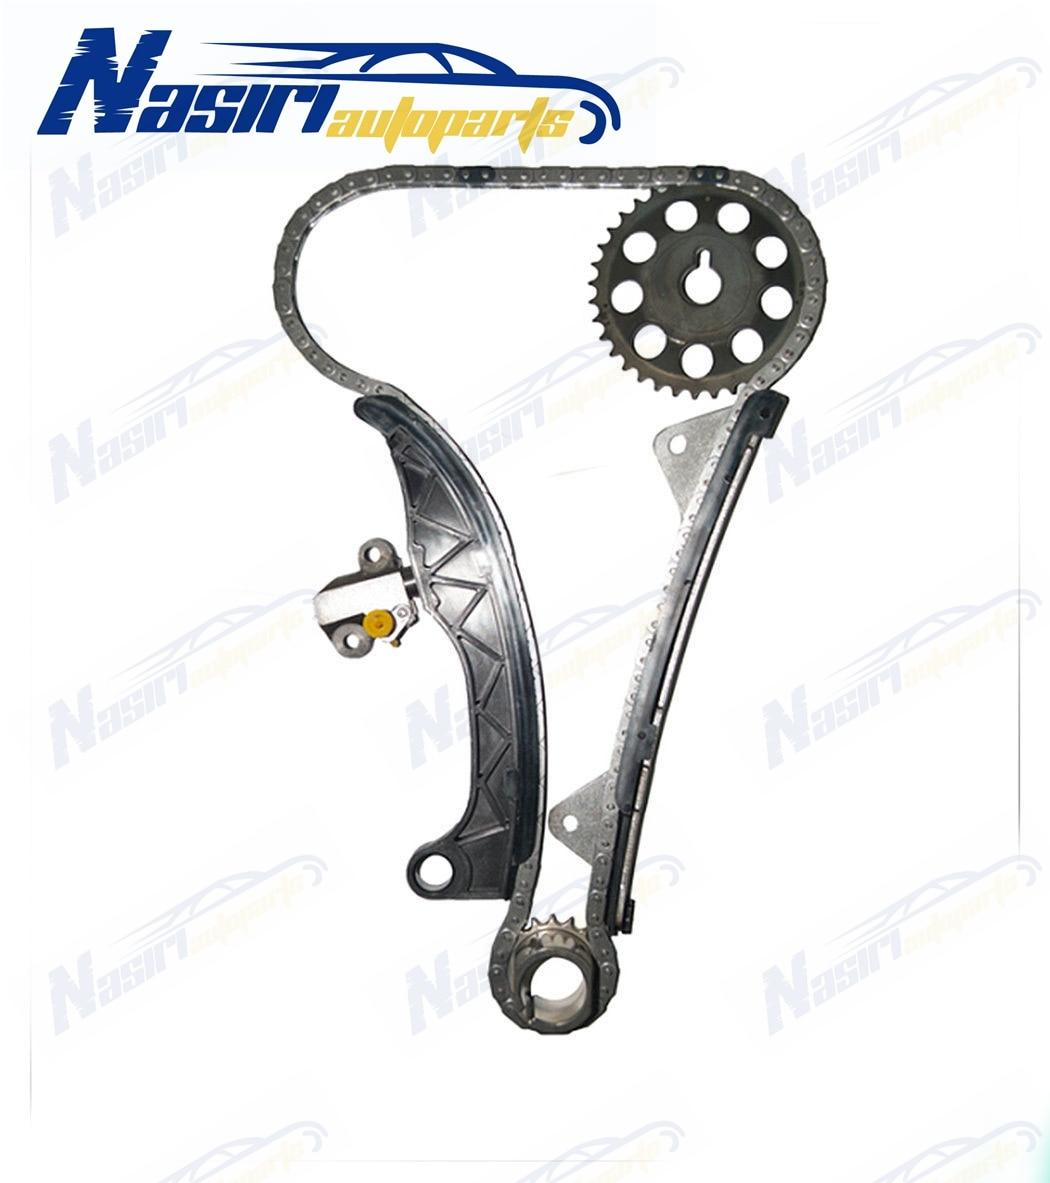 medium resolution of timing chain kit for toyota new yaris 1kr fe 1 0 aygo 1 0 05 daihatsu boon sproket